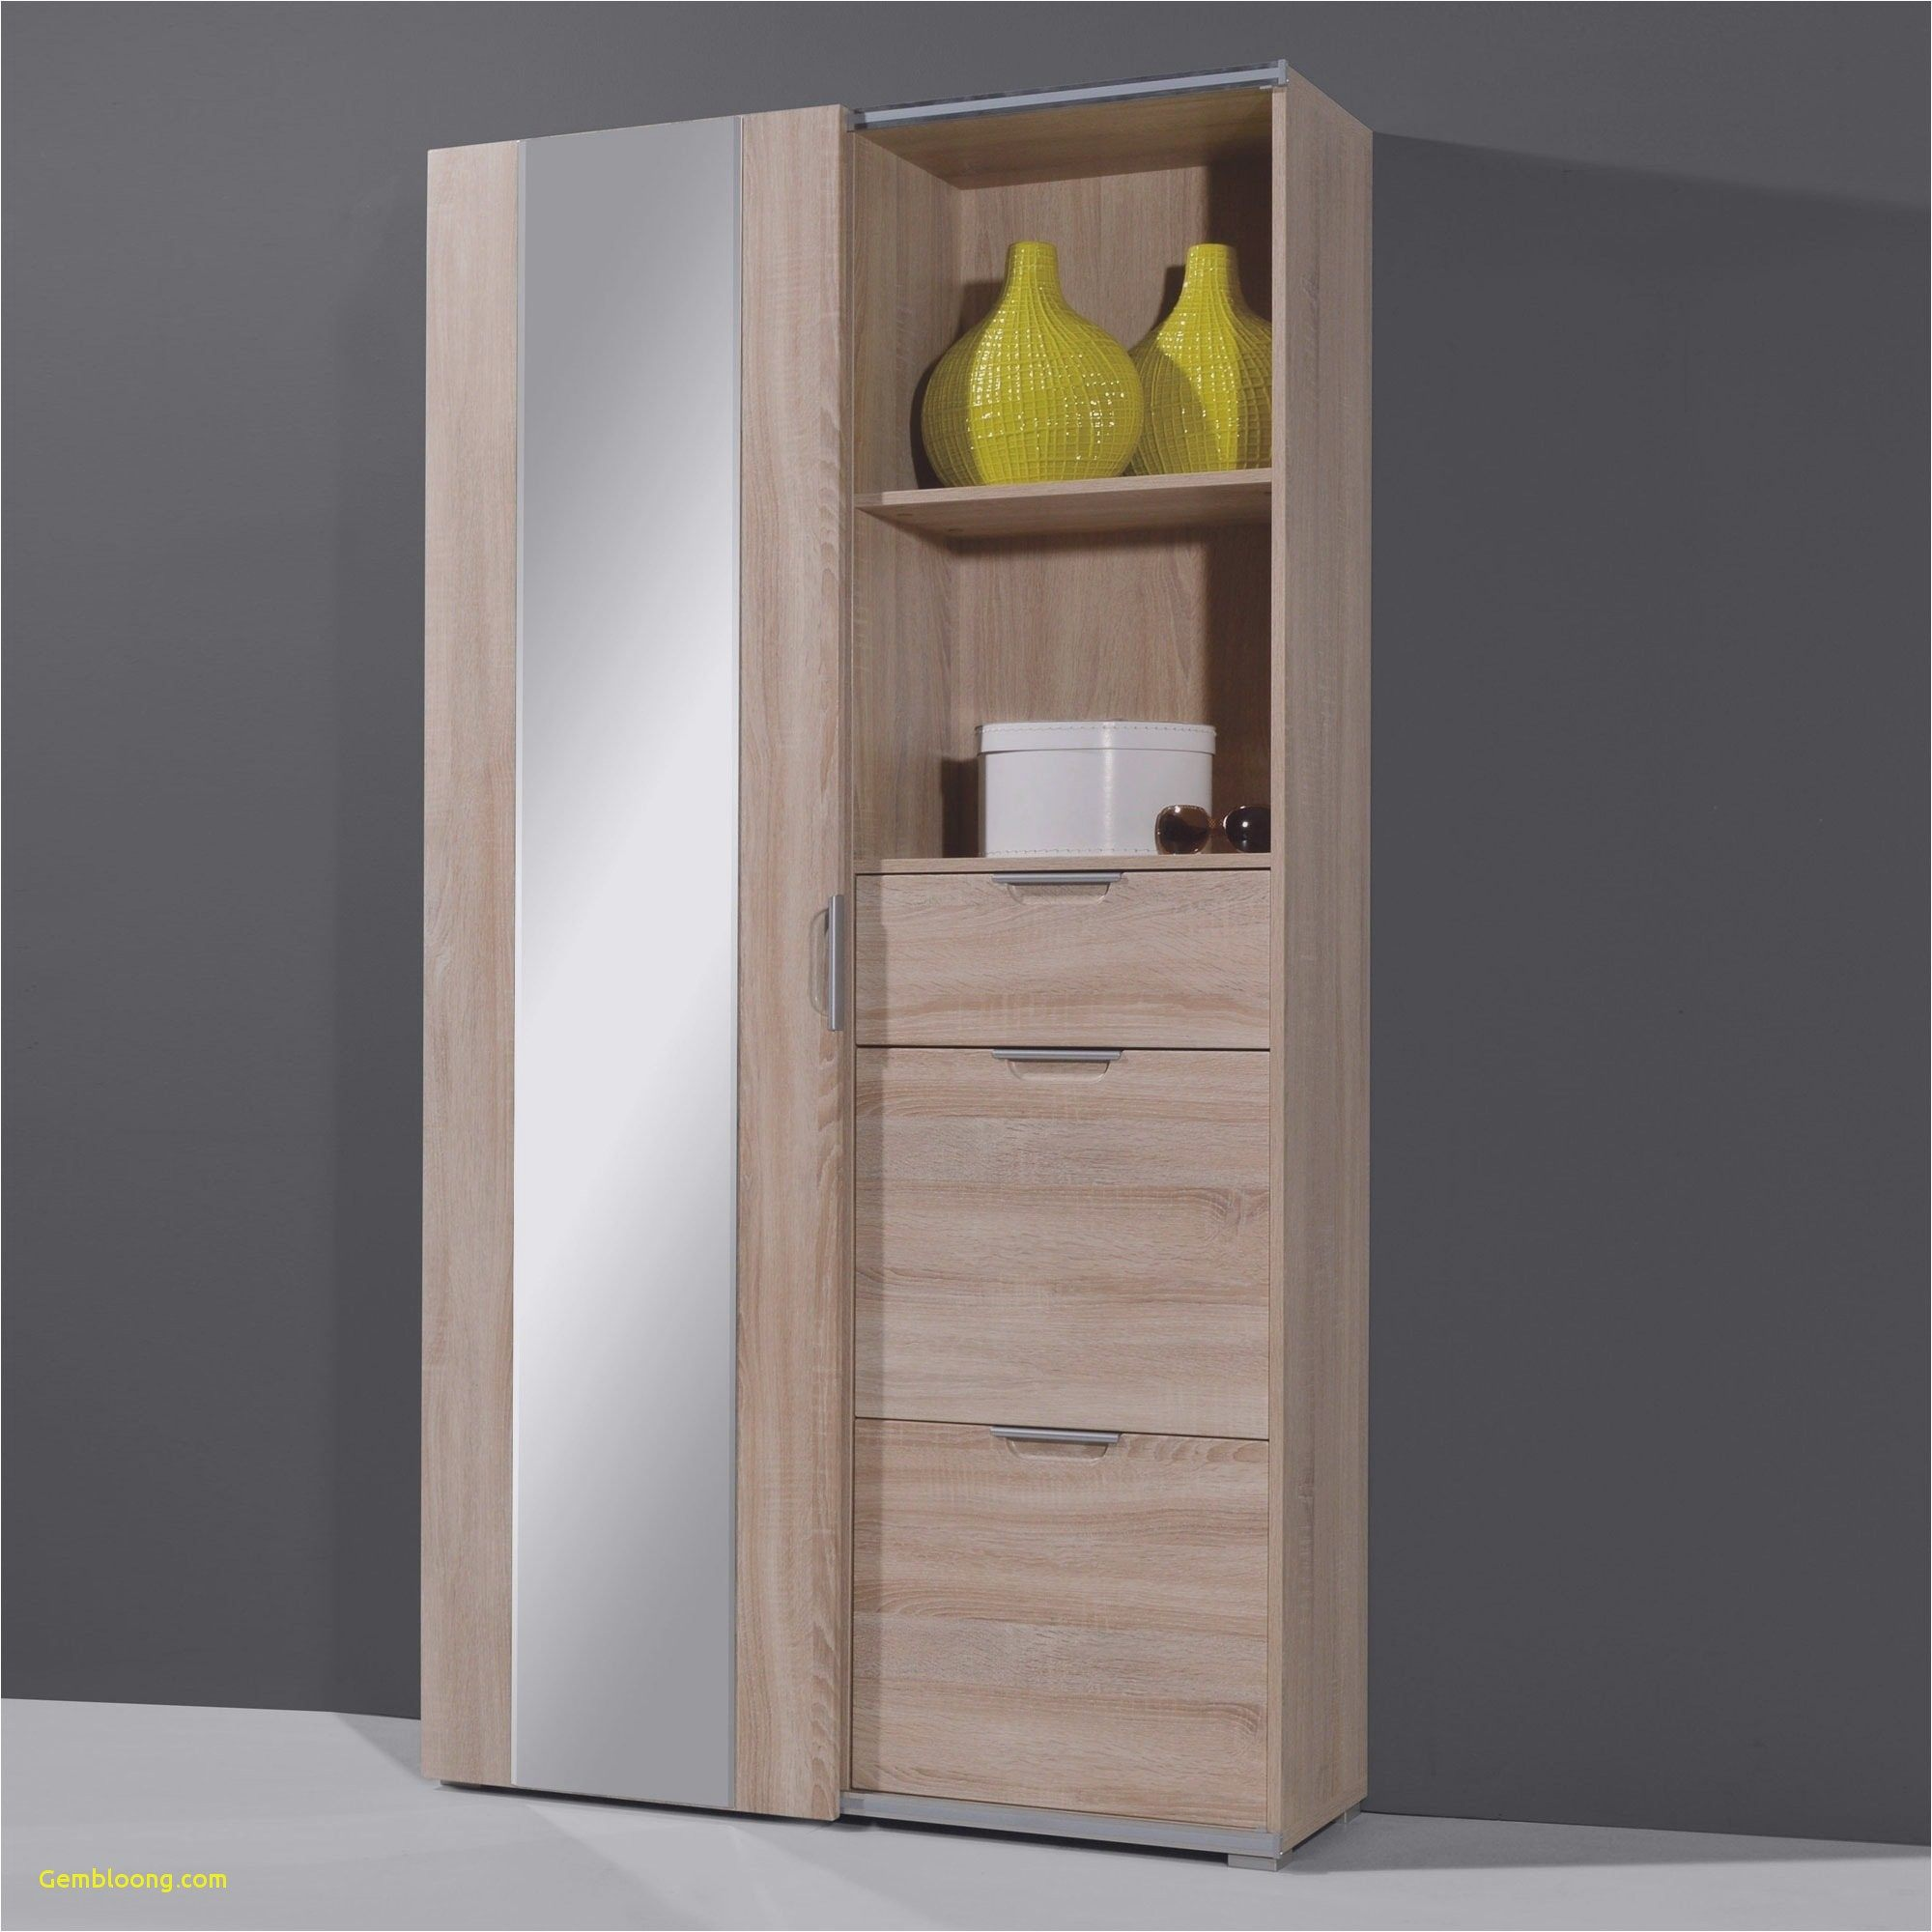 Lit Mezzanine 120×190 Meilleur De Lit Mezzanine Avec Dressing Lit Mezzanine Avec Bureau Conforama